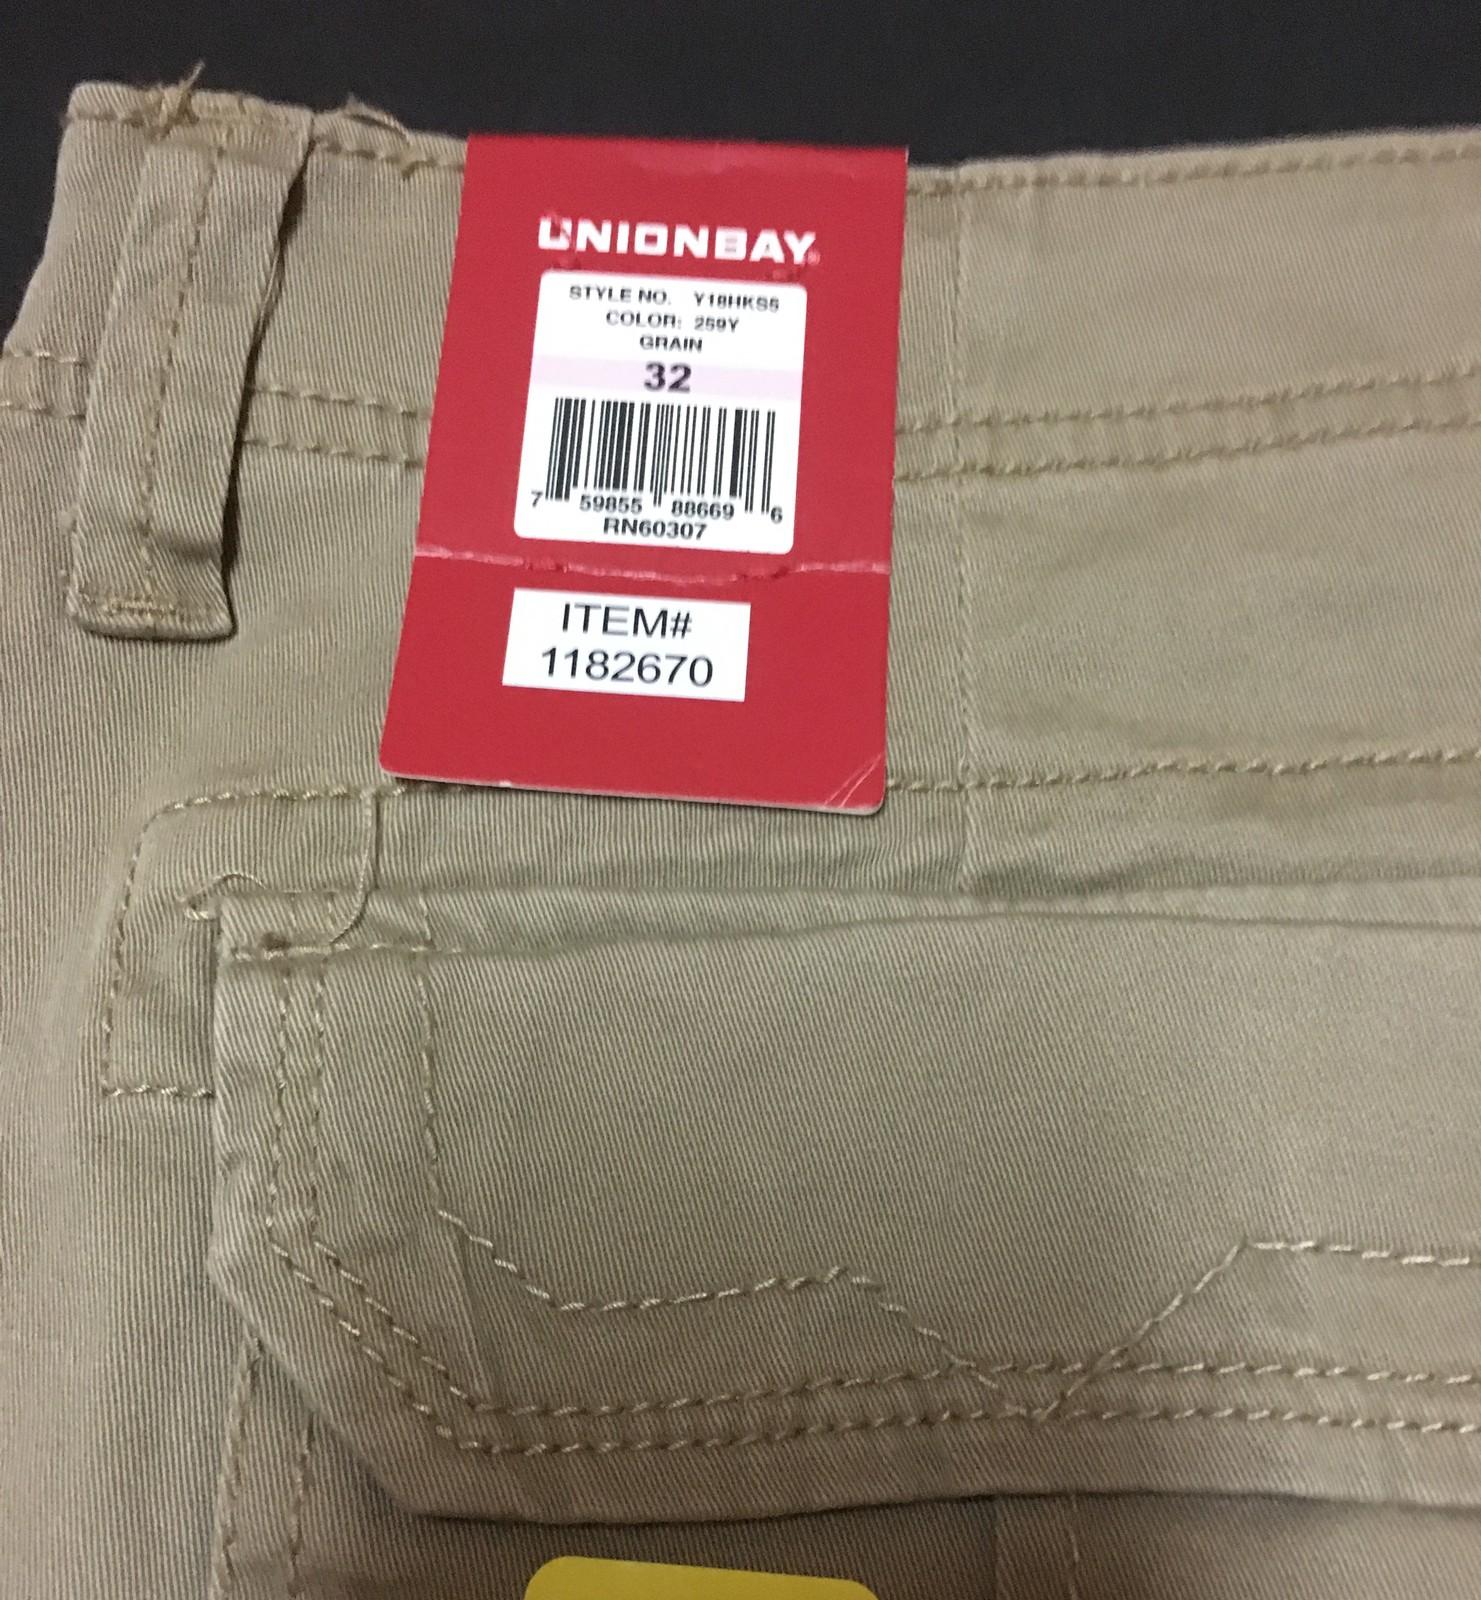 Union Bay Dark Khaki Shorts SZ 32